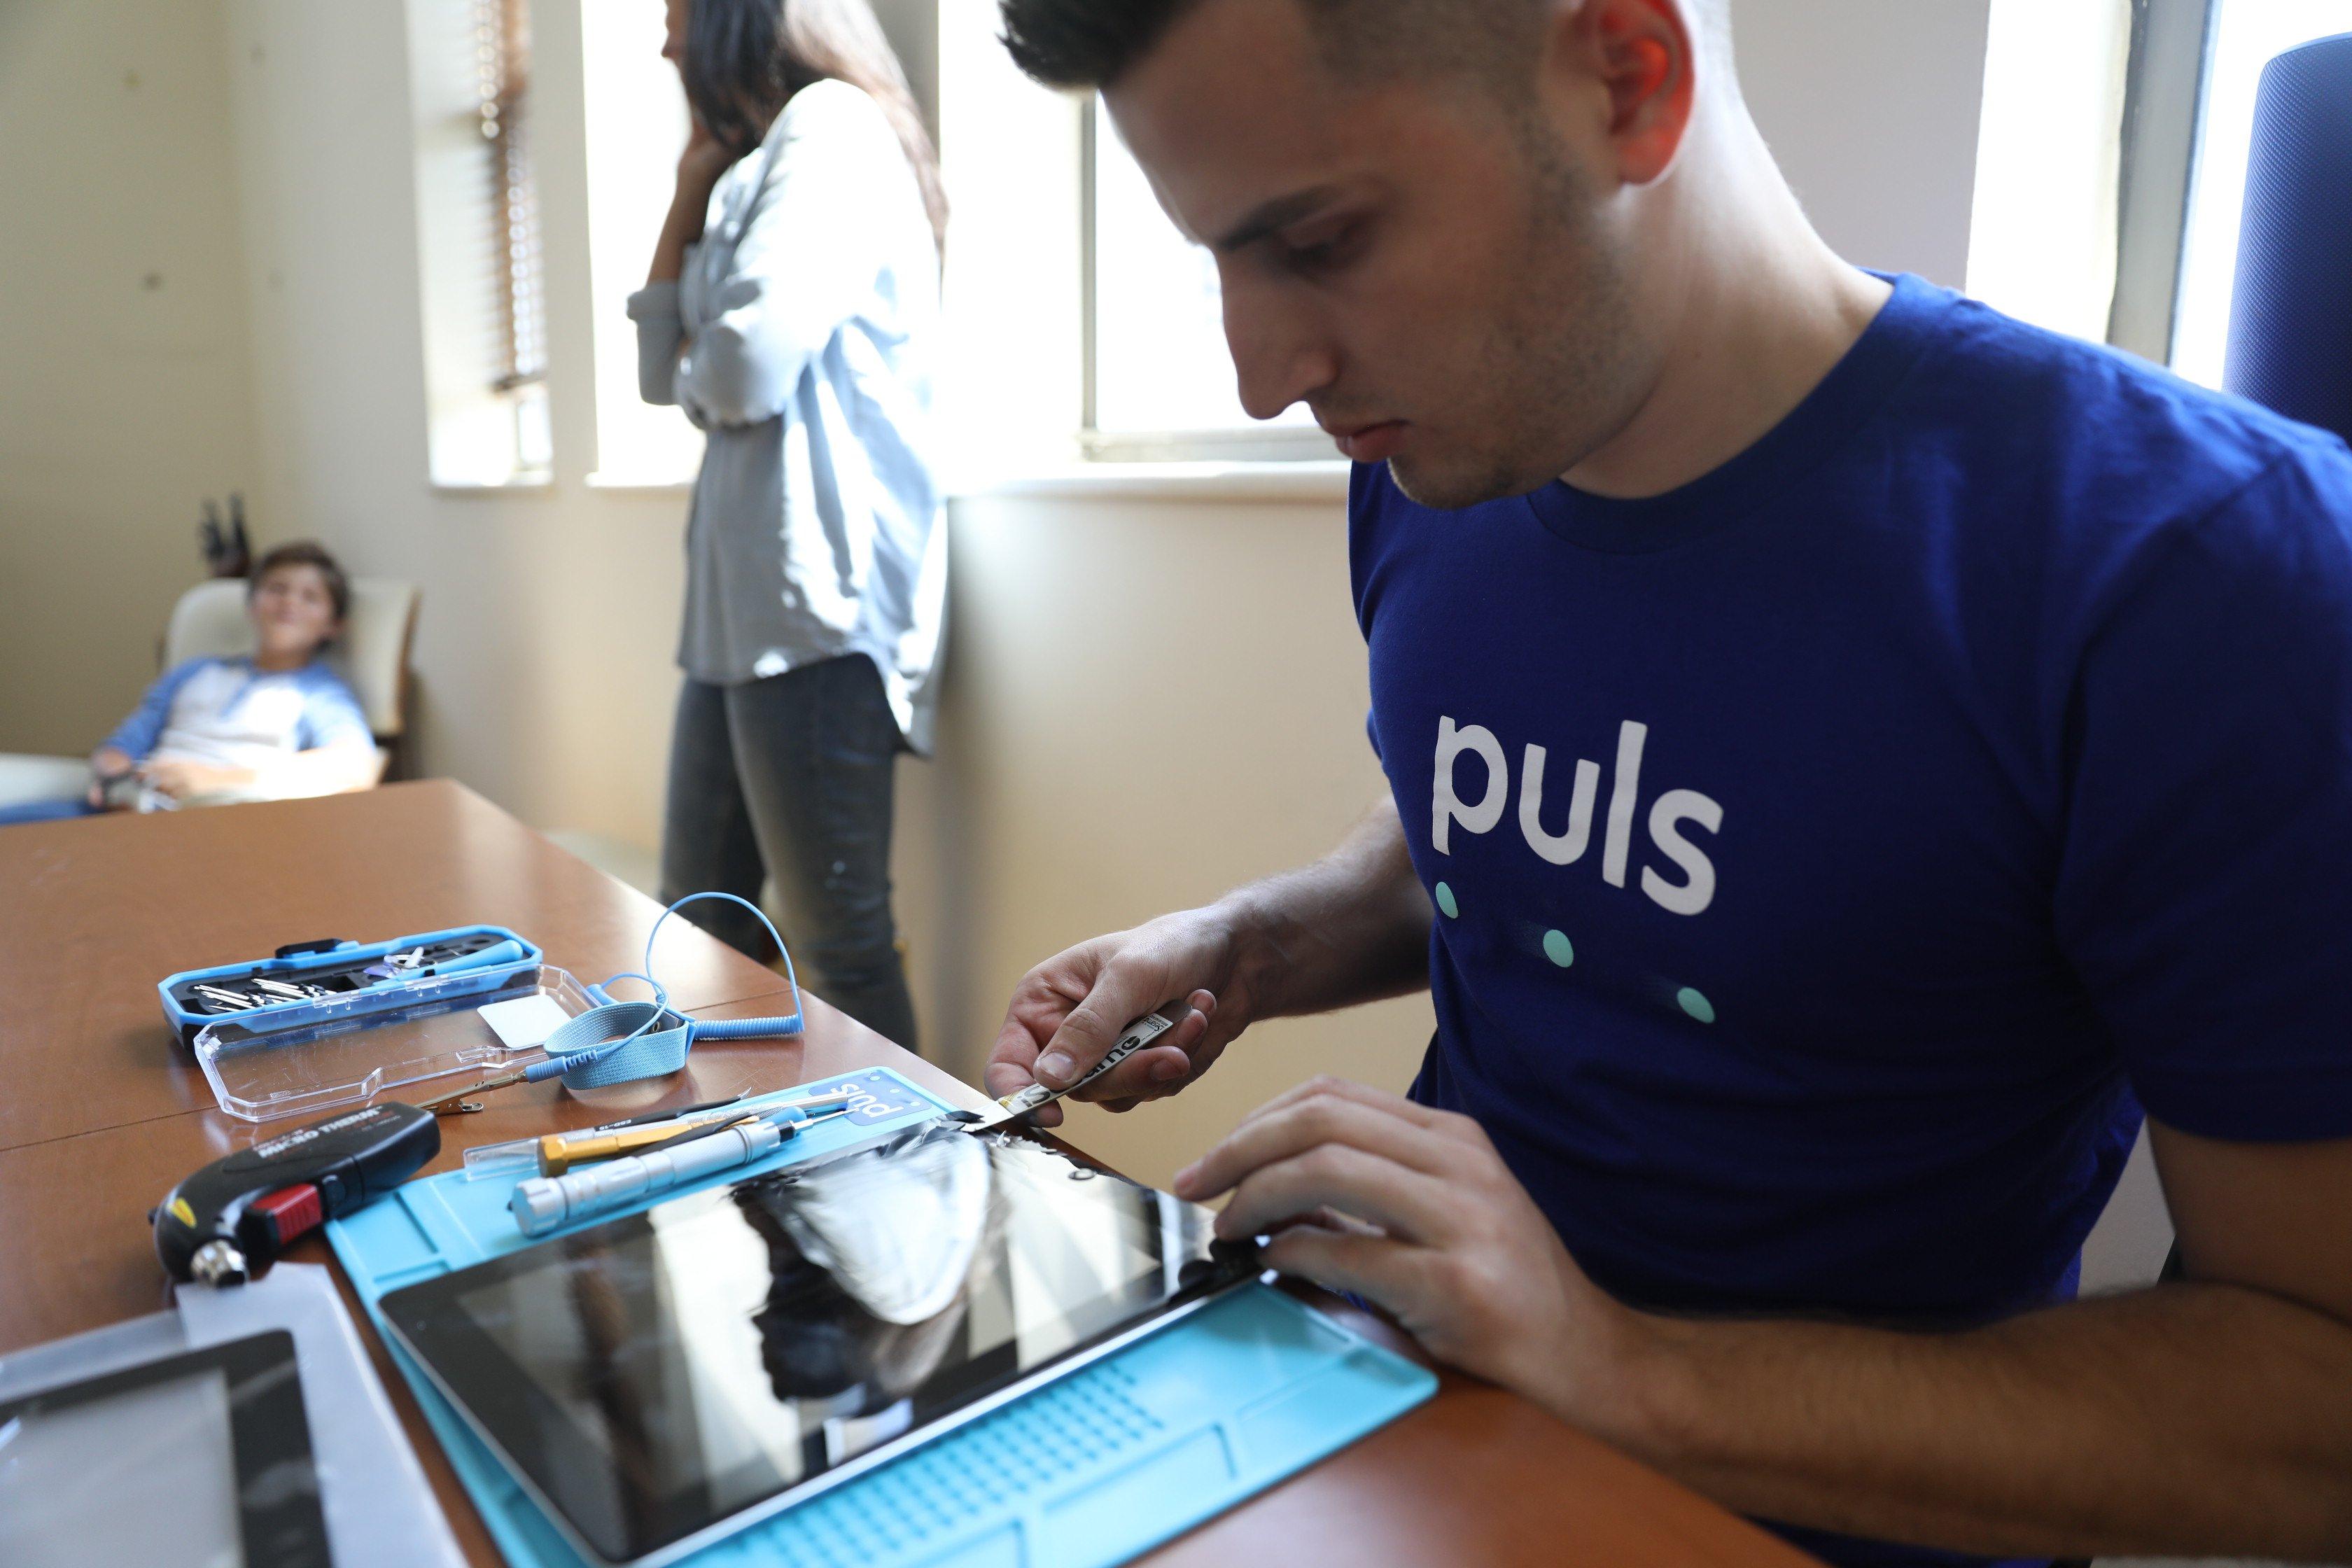 Puls technician repairing iPad